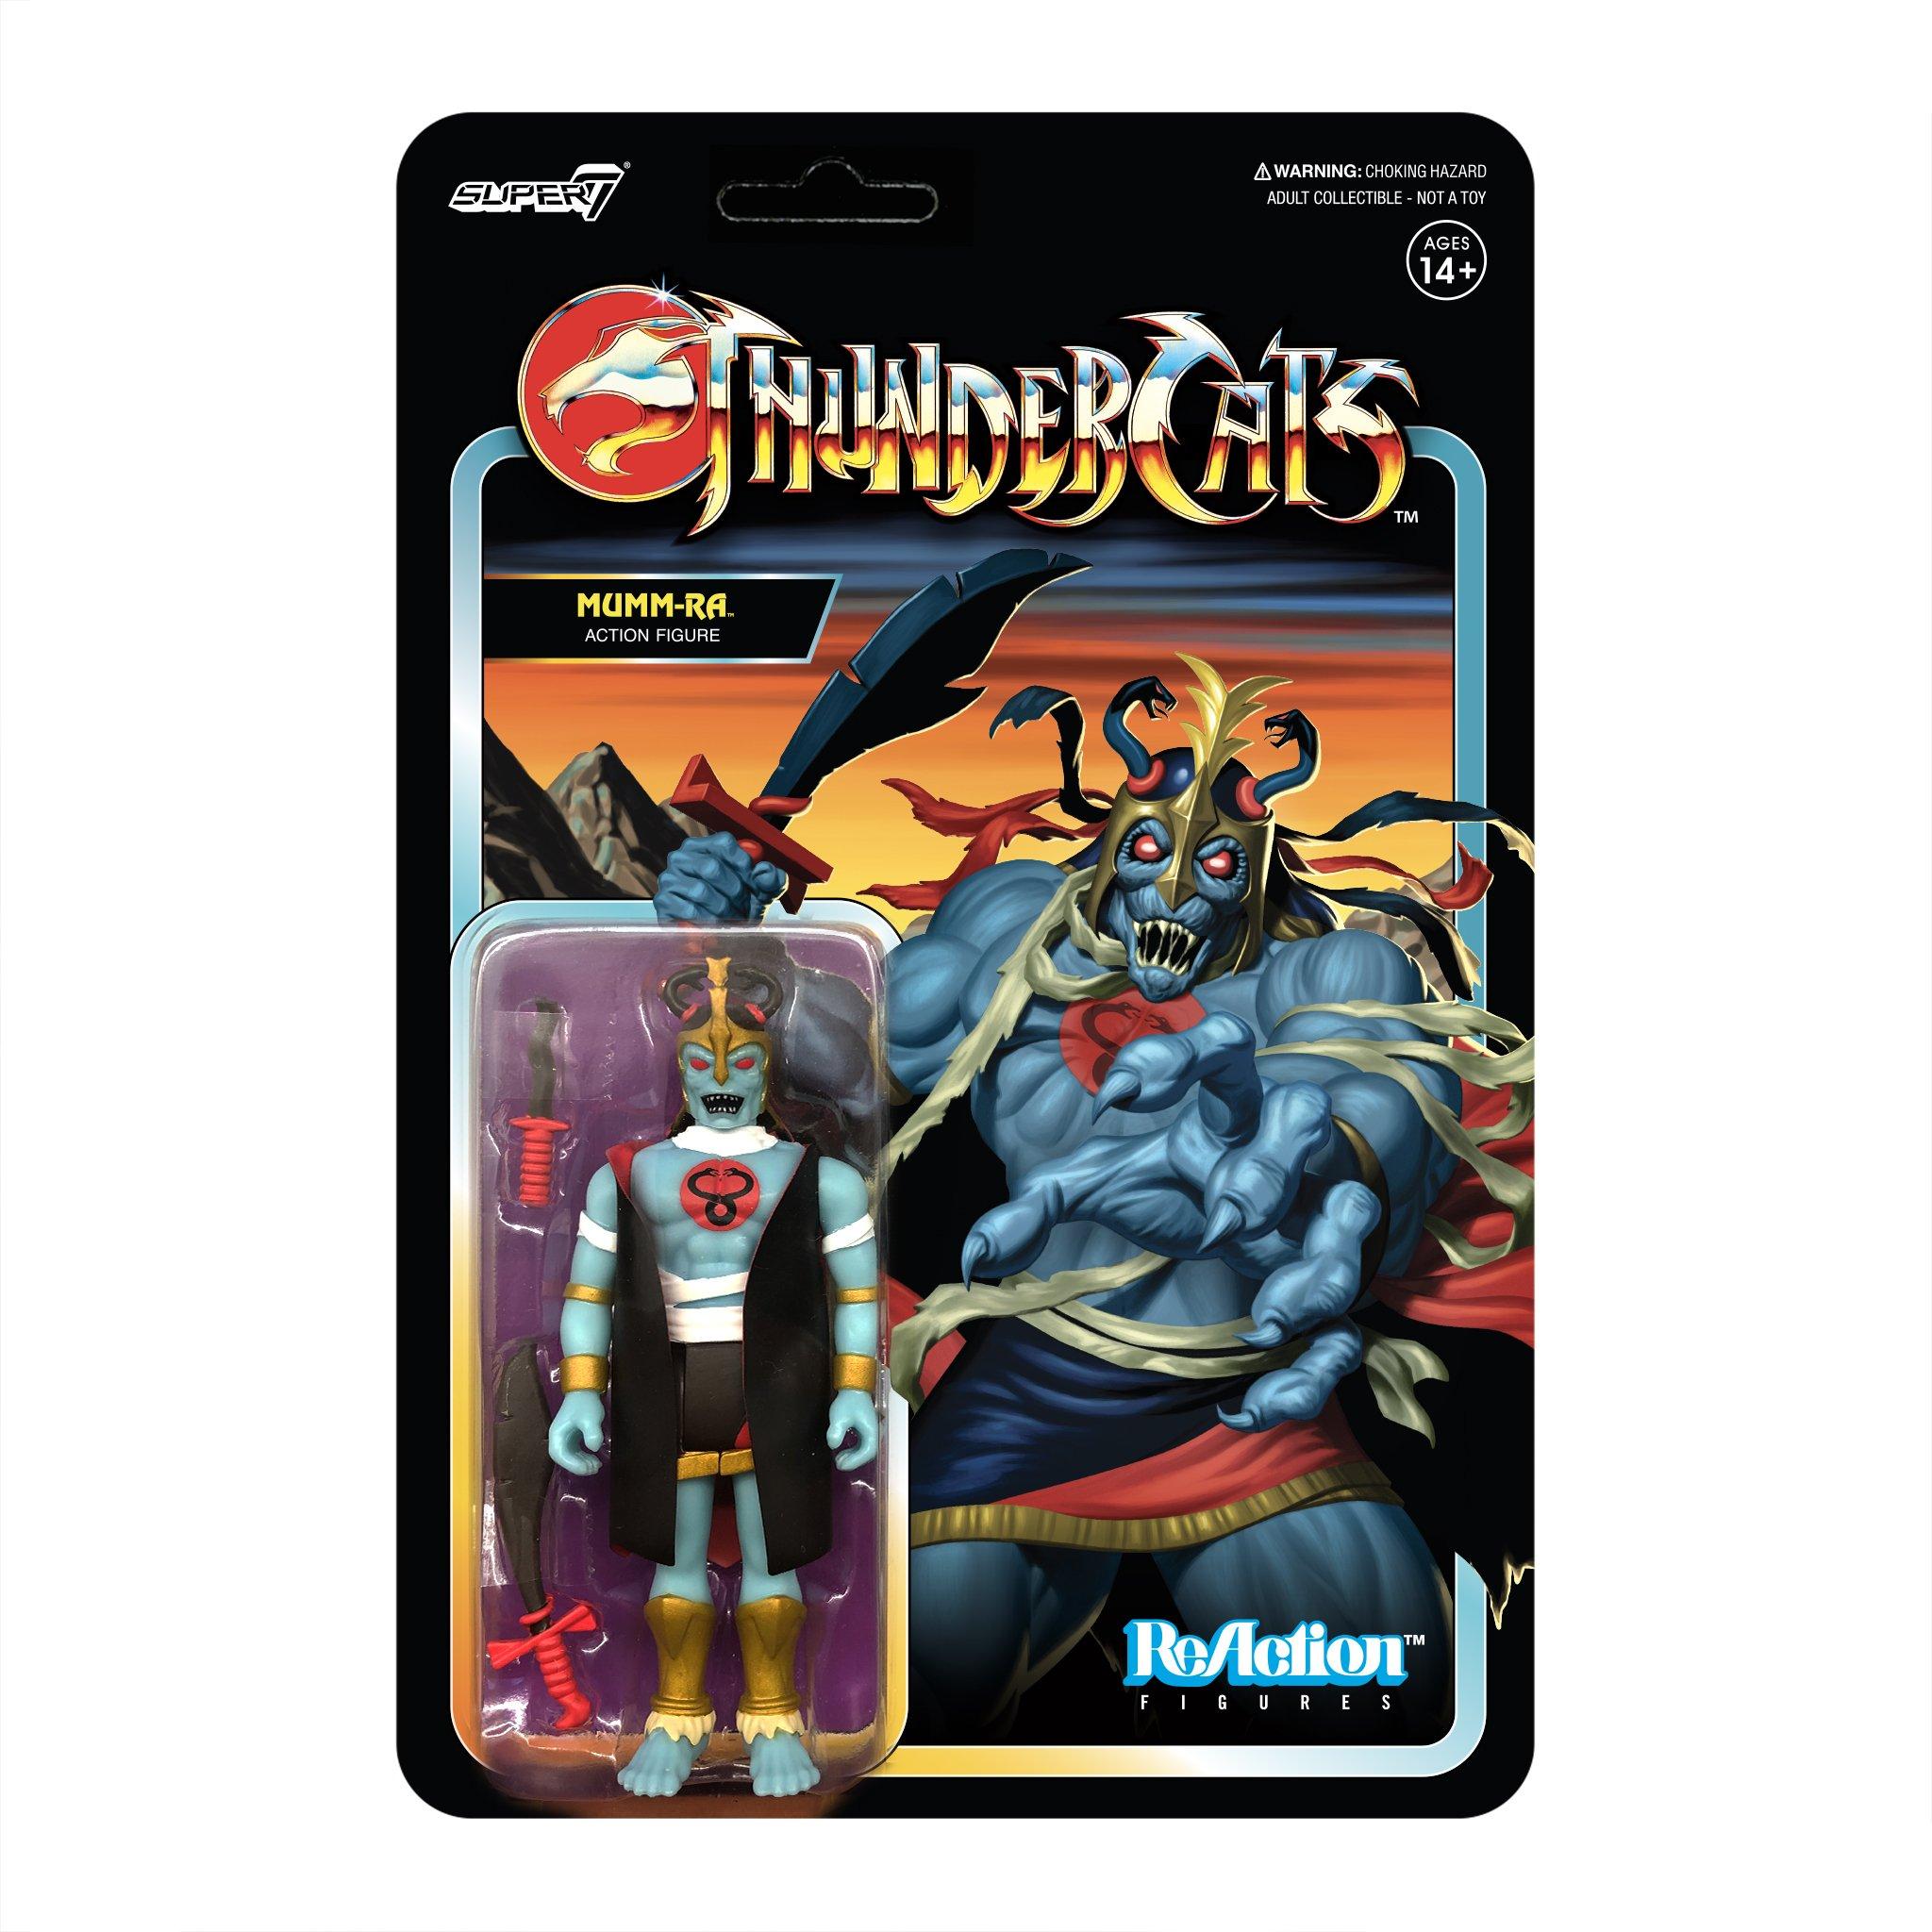 Thundercats: Mumm-Ra Reaction Figure